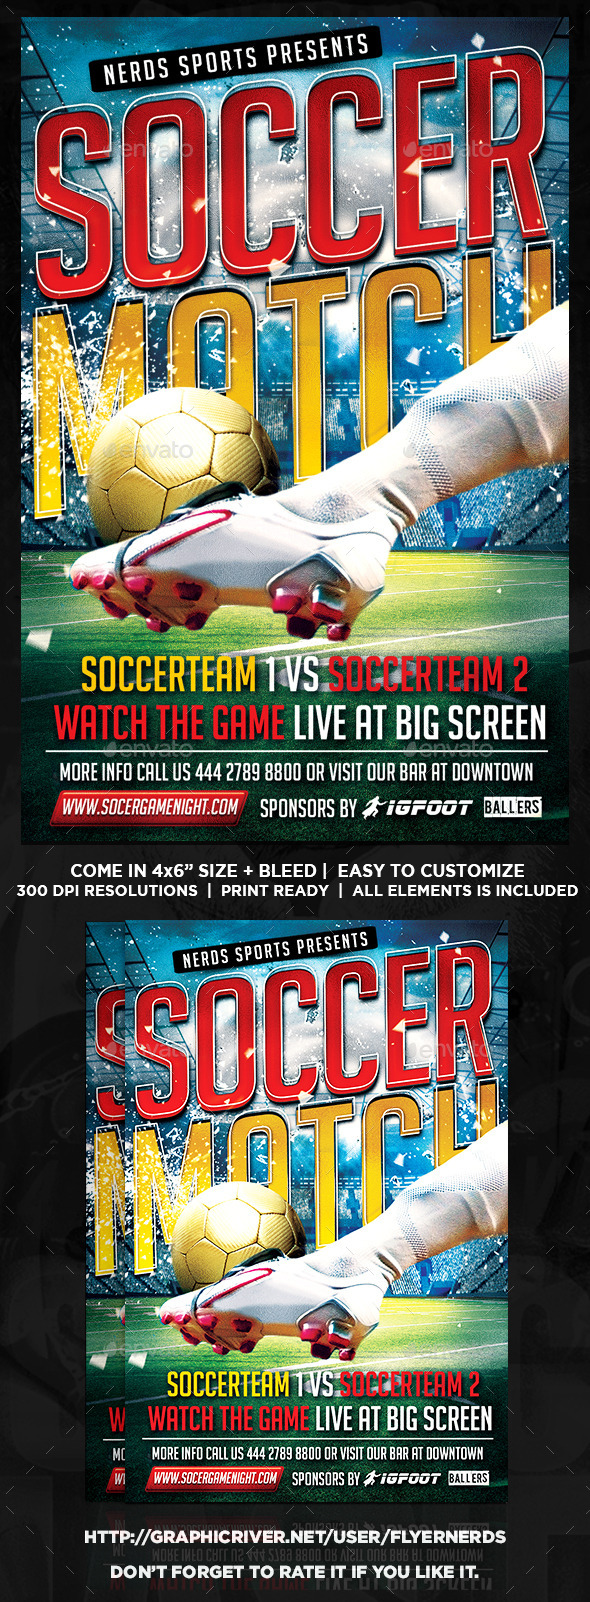 GraphicRiver Soccer Match Flyer 9009958